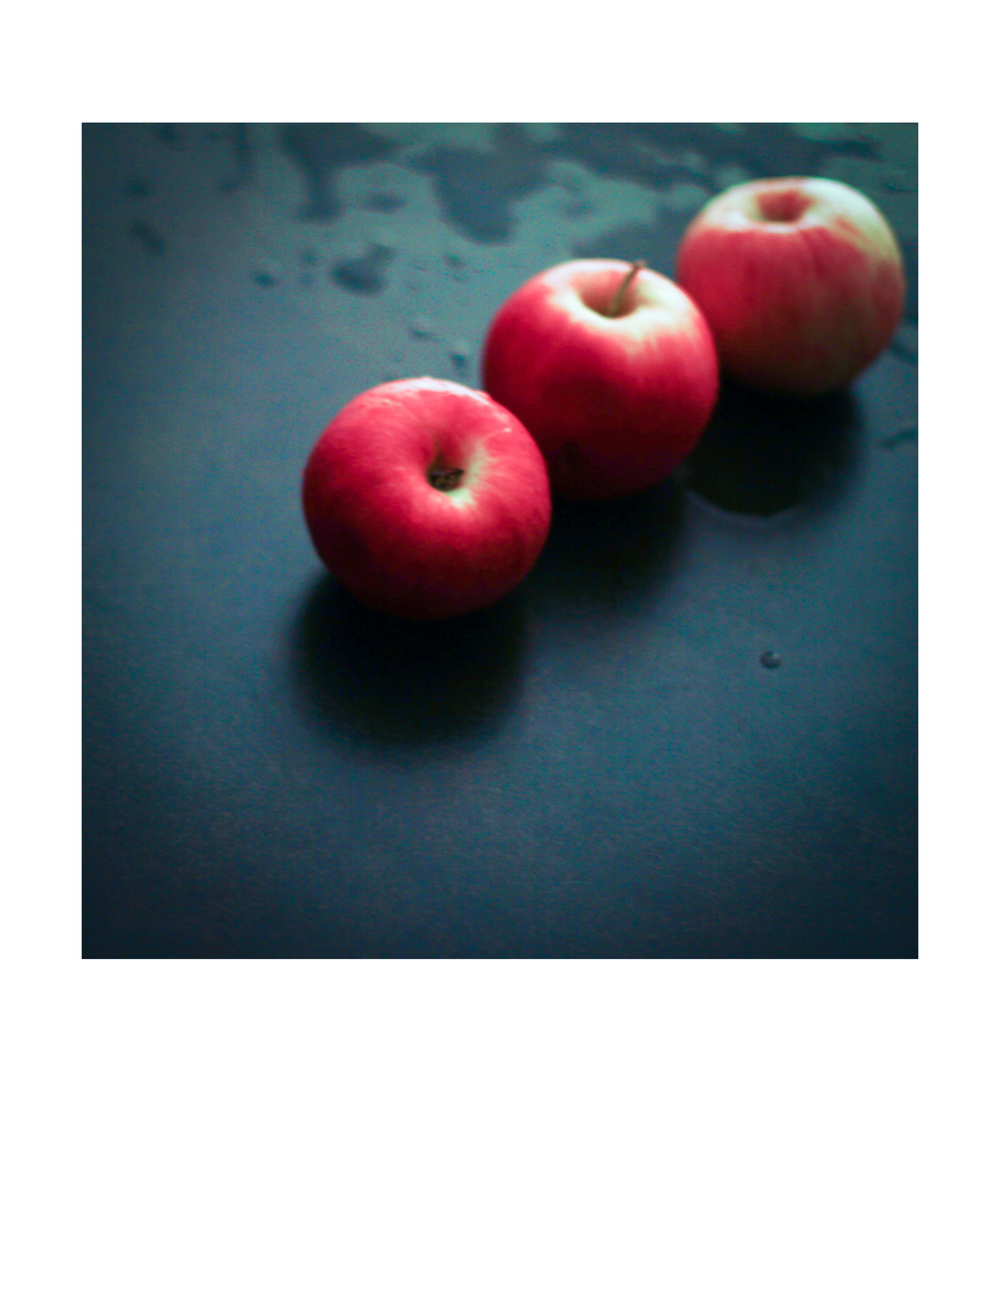 Apples_1_Aneta_6x6.jpg